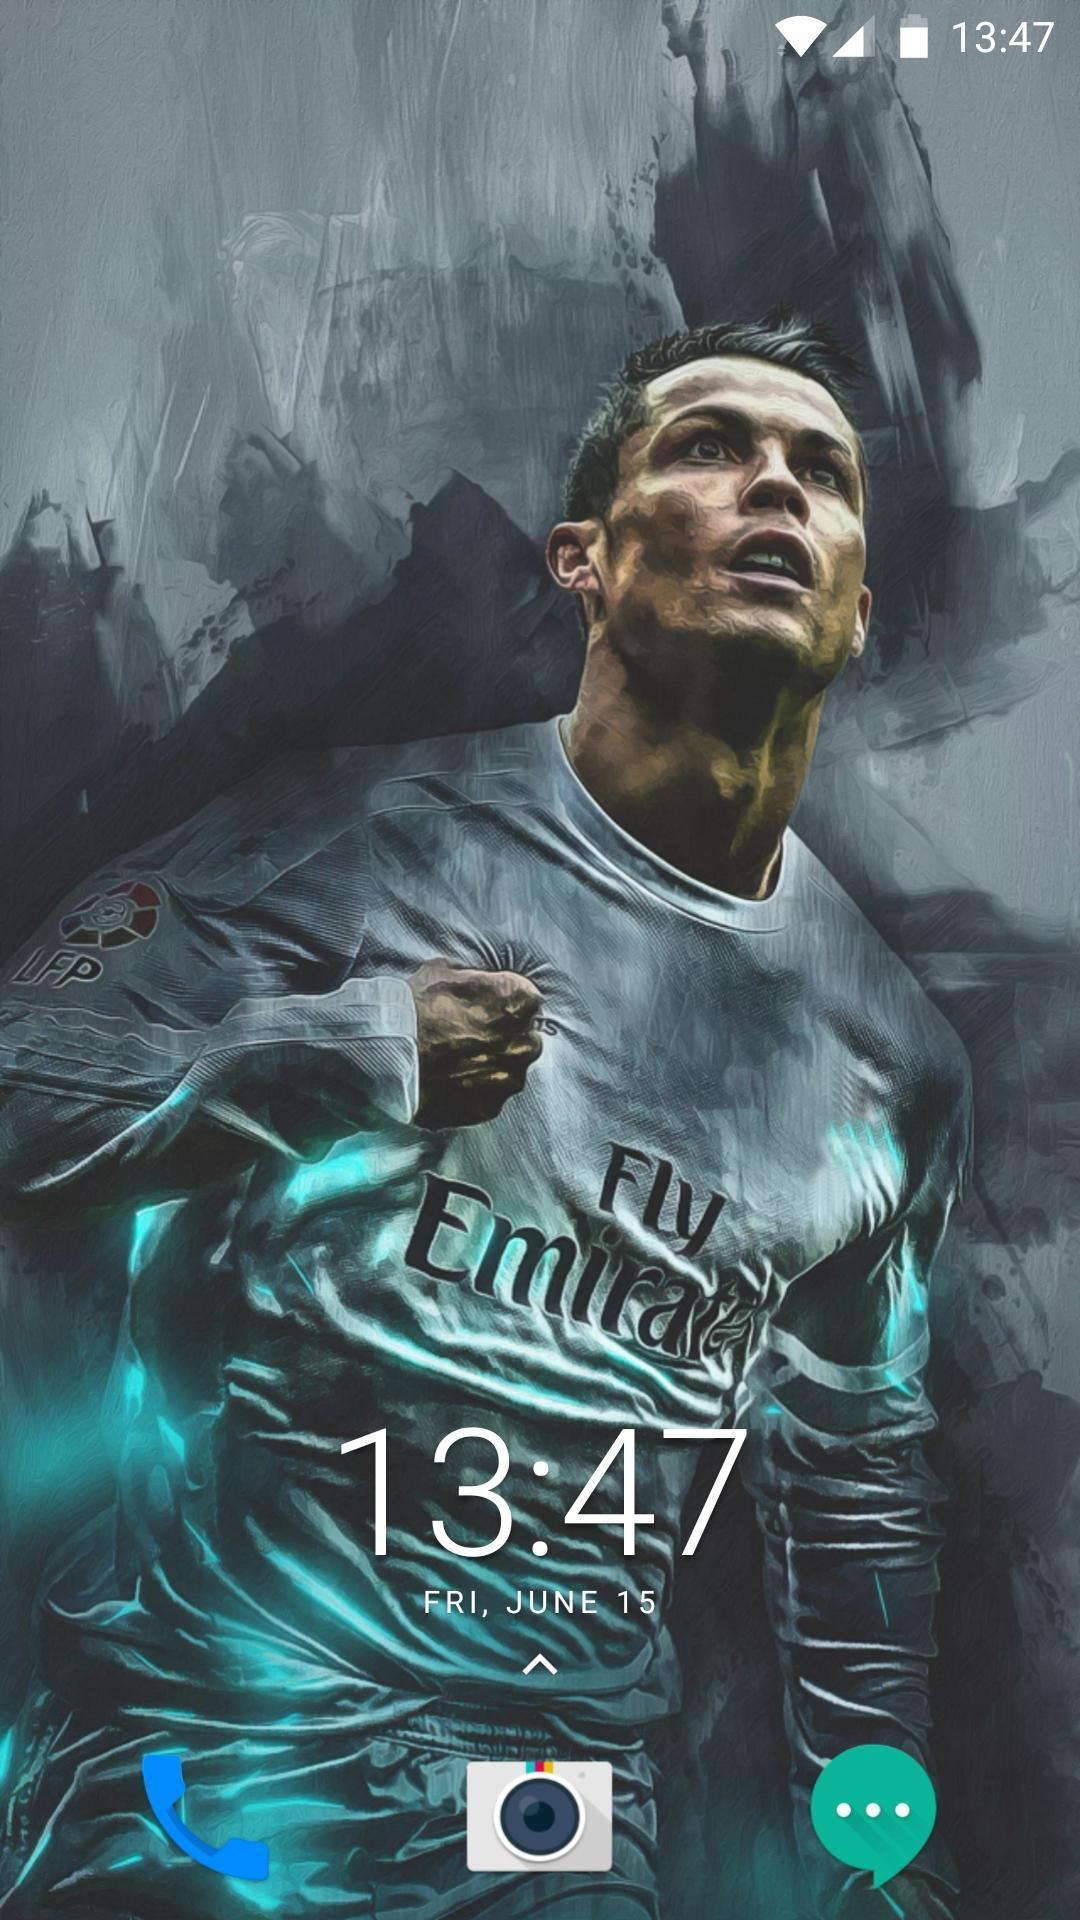 Cristiano Ronaldo Cr7 Wallpaper Football Wallpaper For Android Apk Download